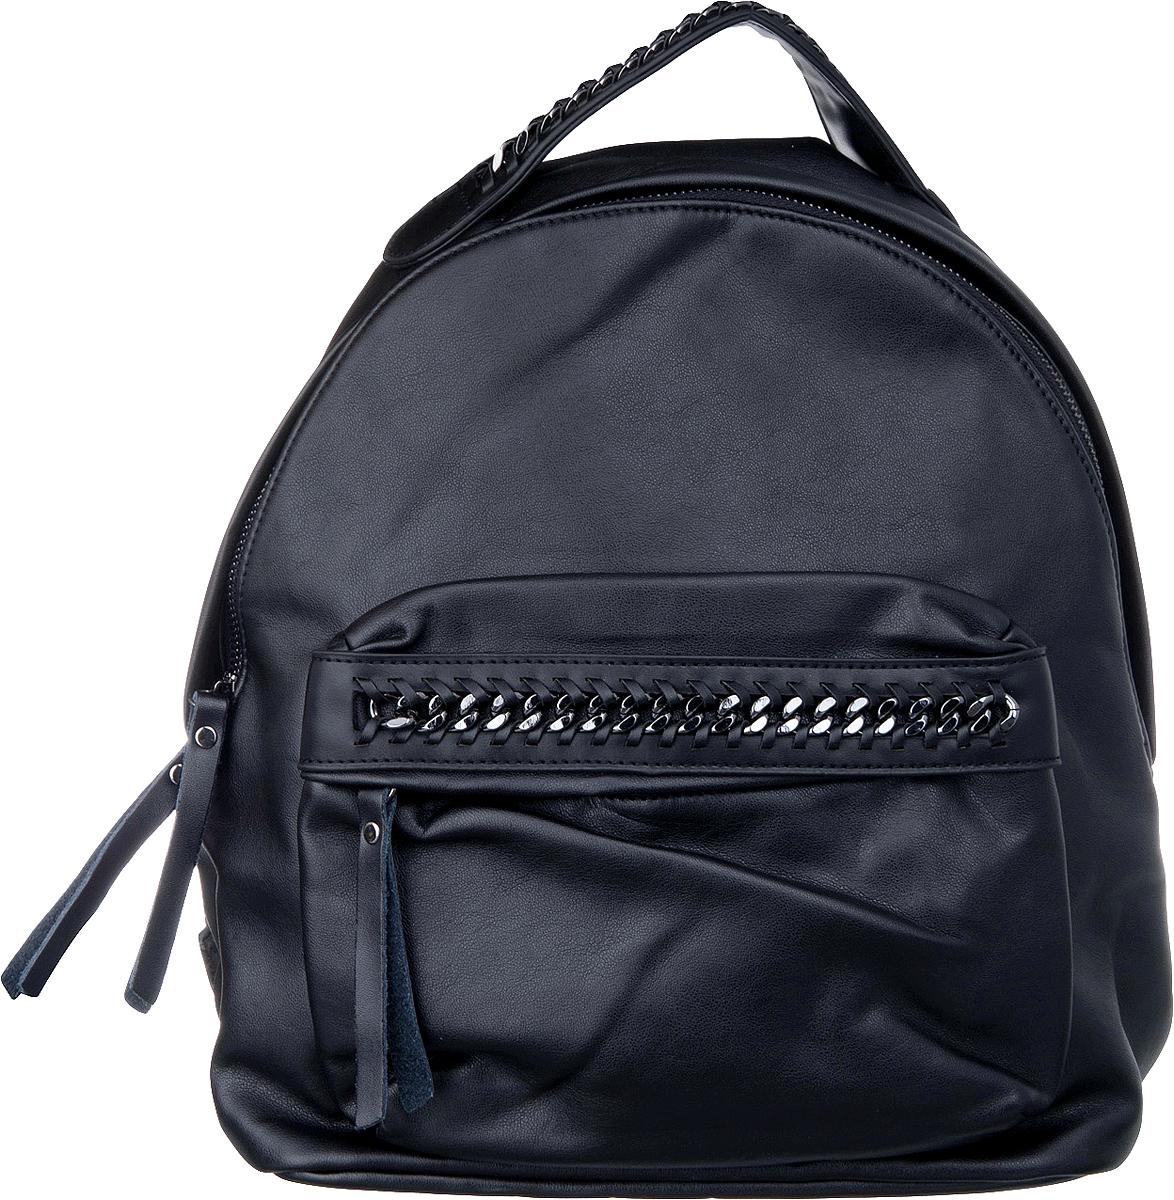 цена Рюкзак женский Vitacci, цвет: черный. BG01001-1 онлайн в 2017 году